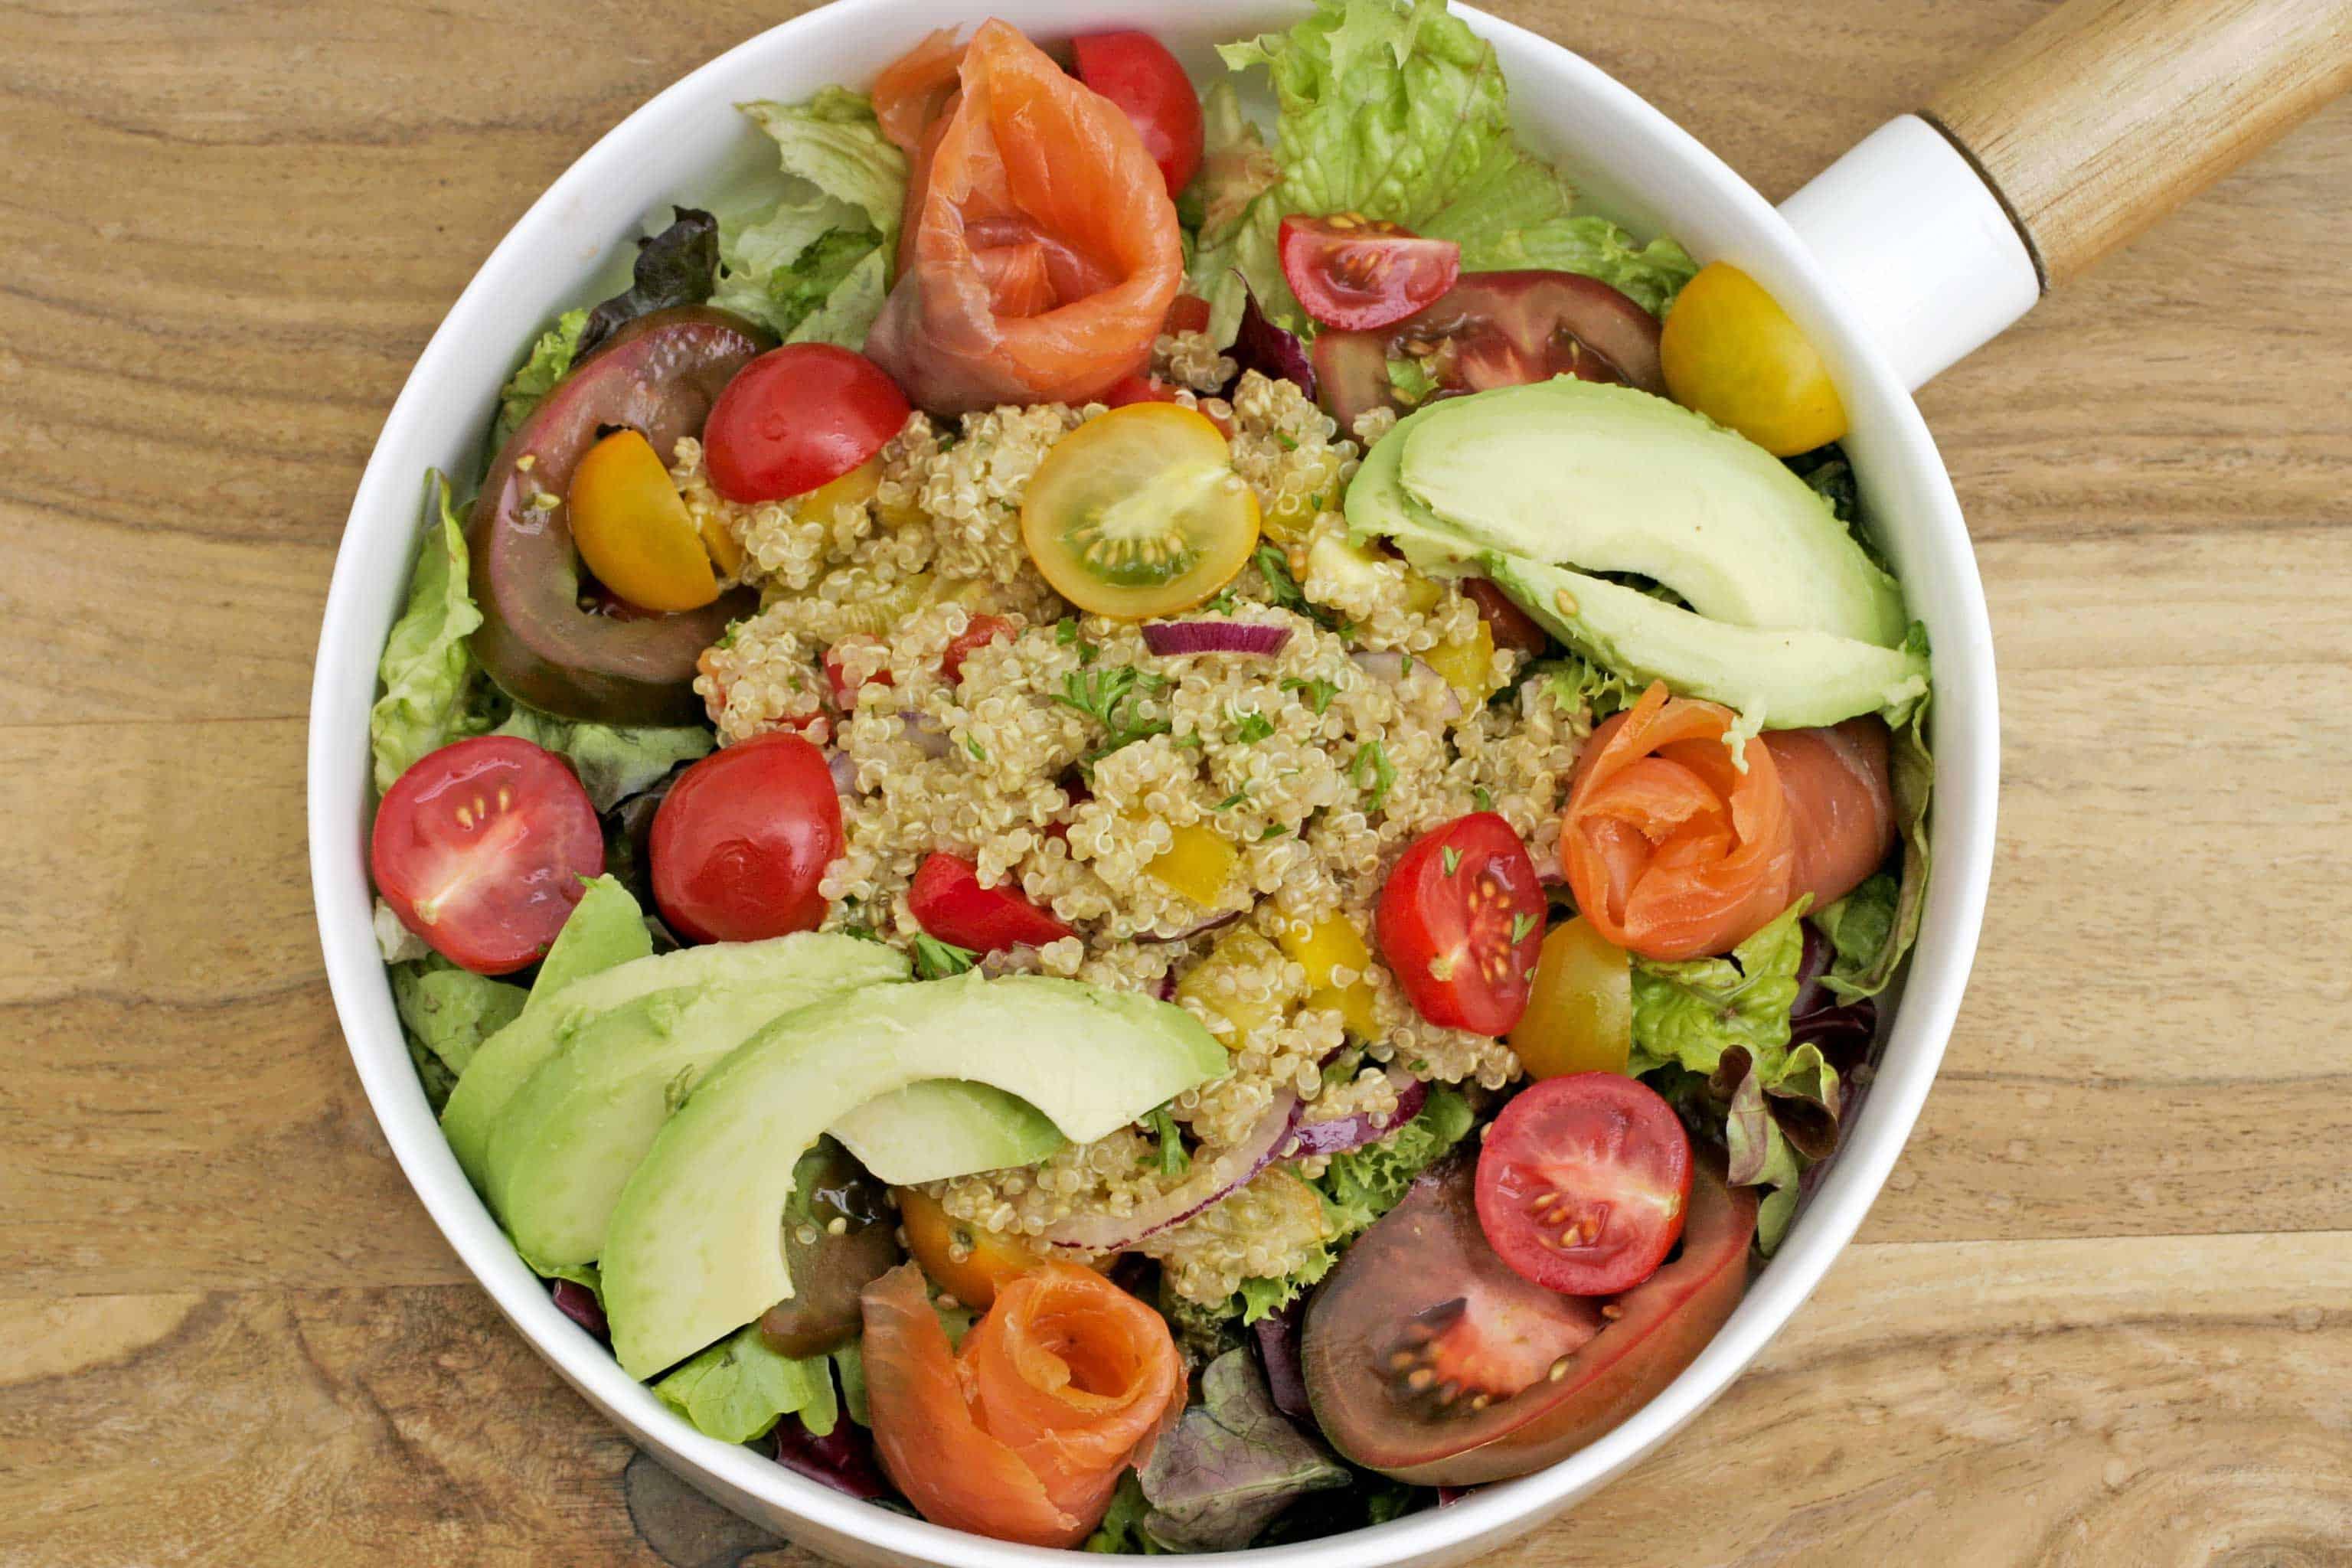 lunch salade met quinoa zalm keukenrevolutie foodblog. Black Bedroom Furniture Sets. Home Design Ideas